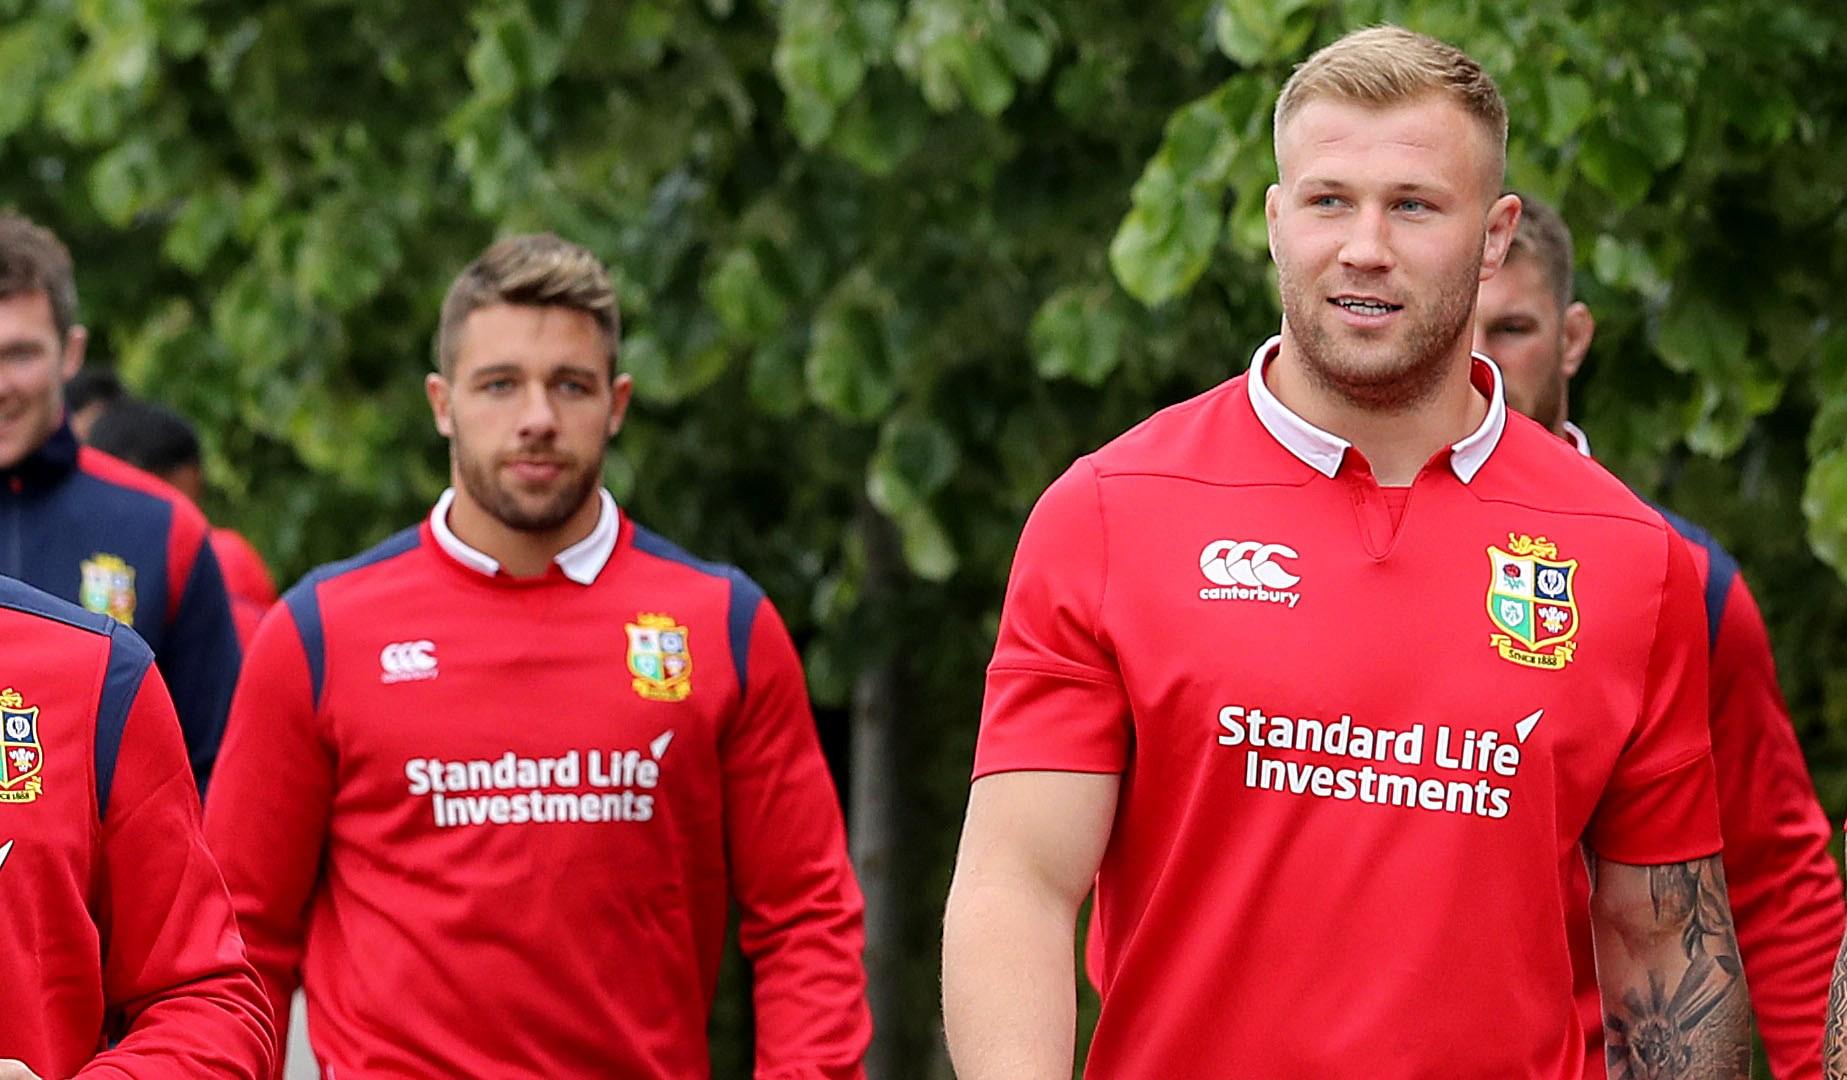 Gloucester's Lions ready for European fight in Edinburgh